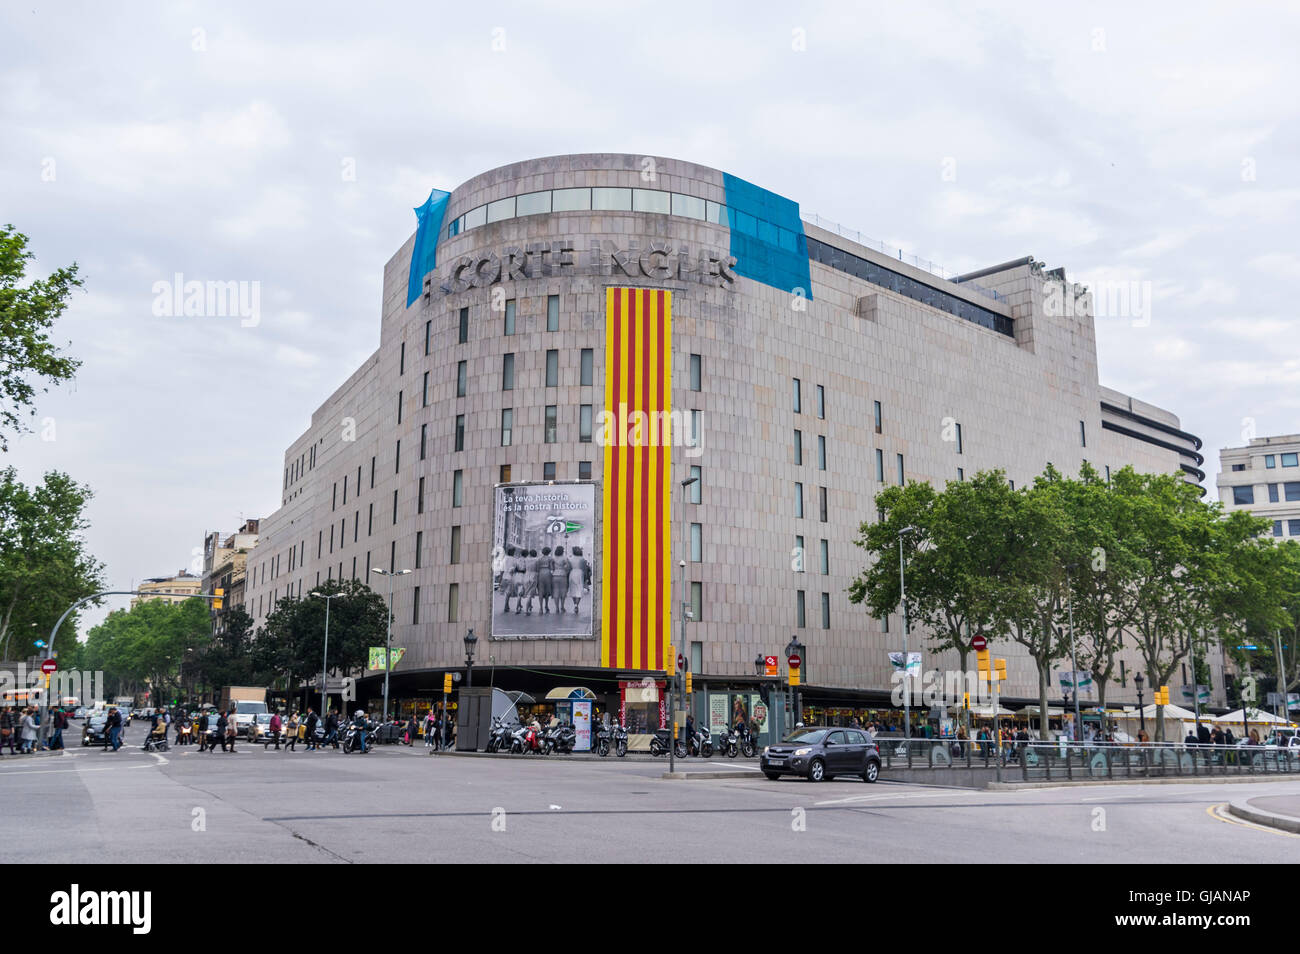 El corte ingl s department store building in barcelona catalonia stock photo royalty free - El corte ingles stores ...